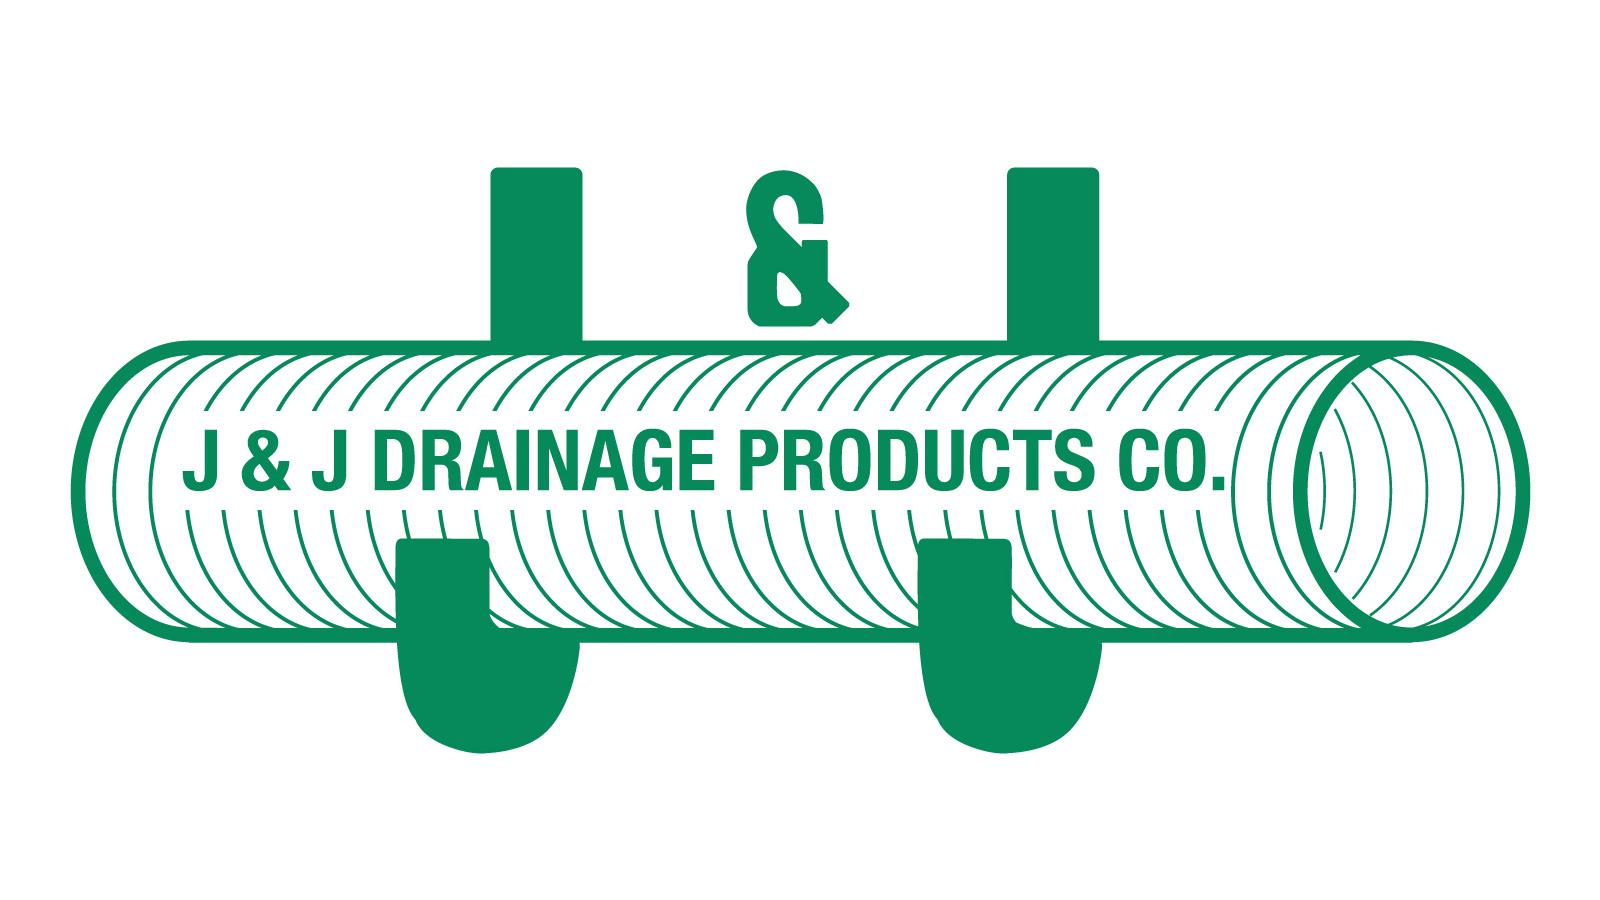 J&J Drainage products